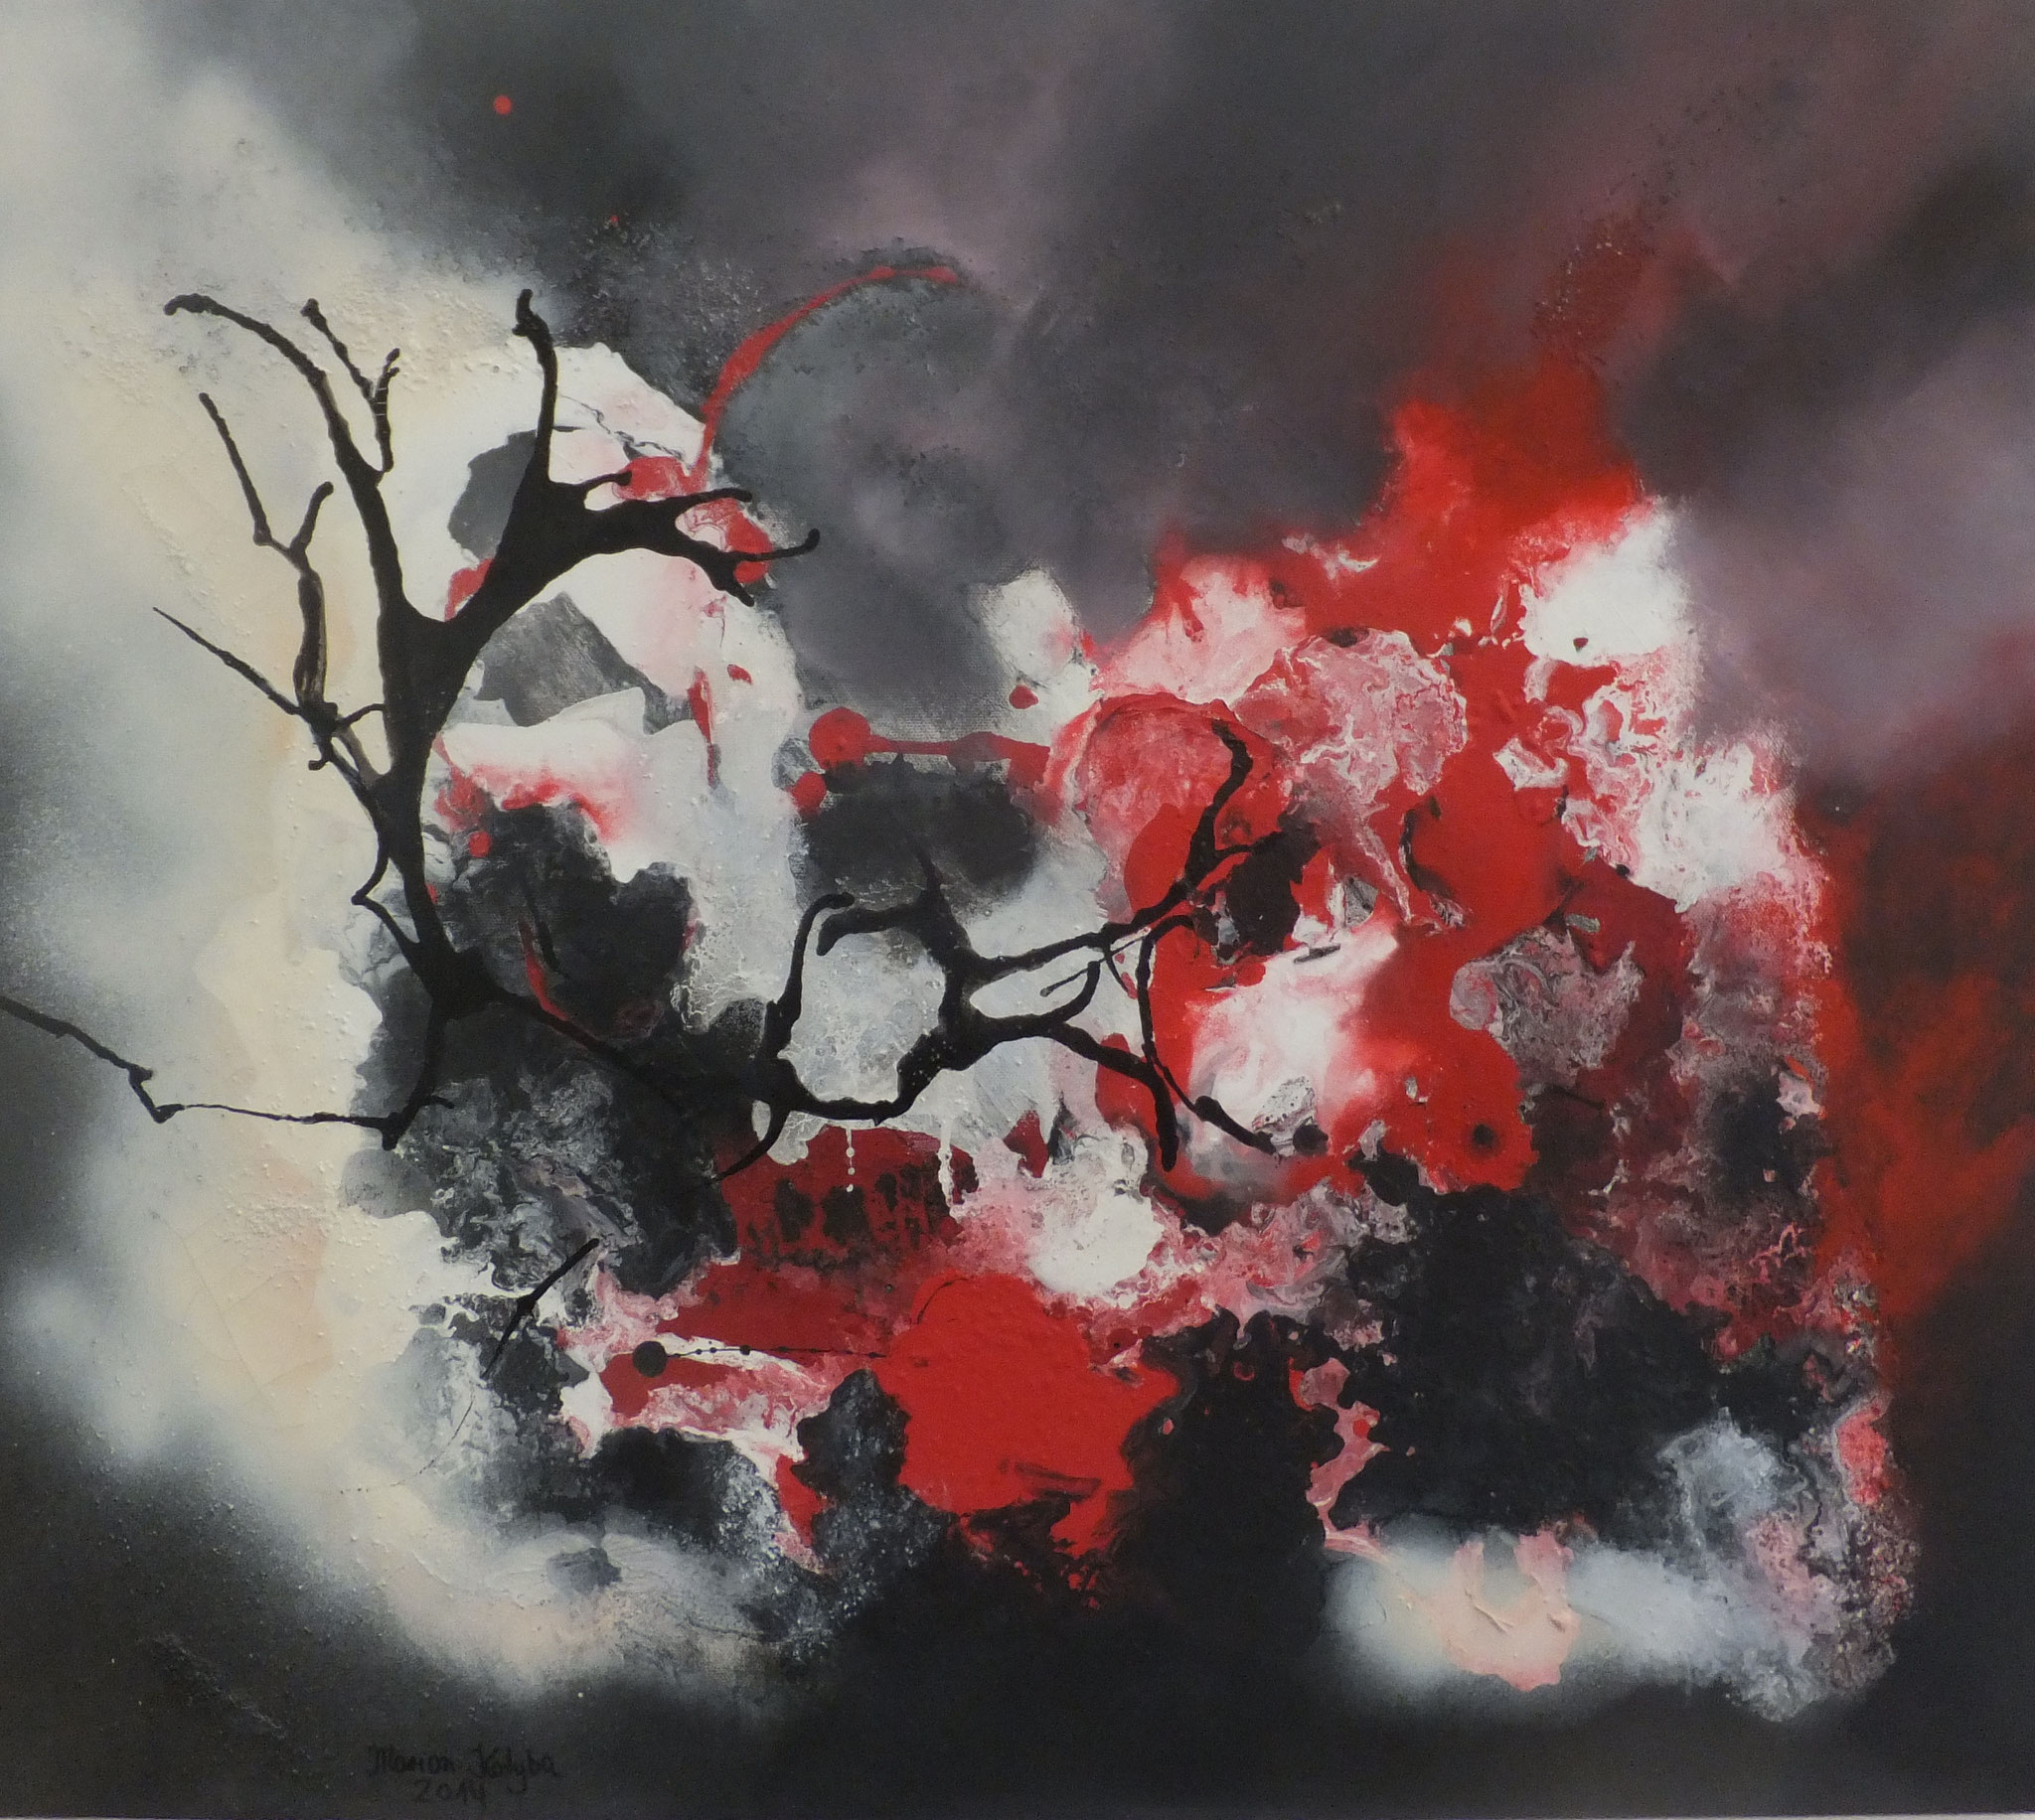 Passione VI 60 x 70 cm verkauft